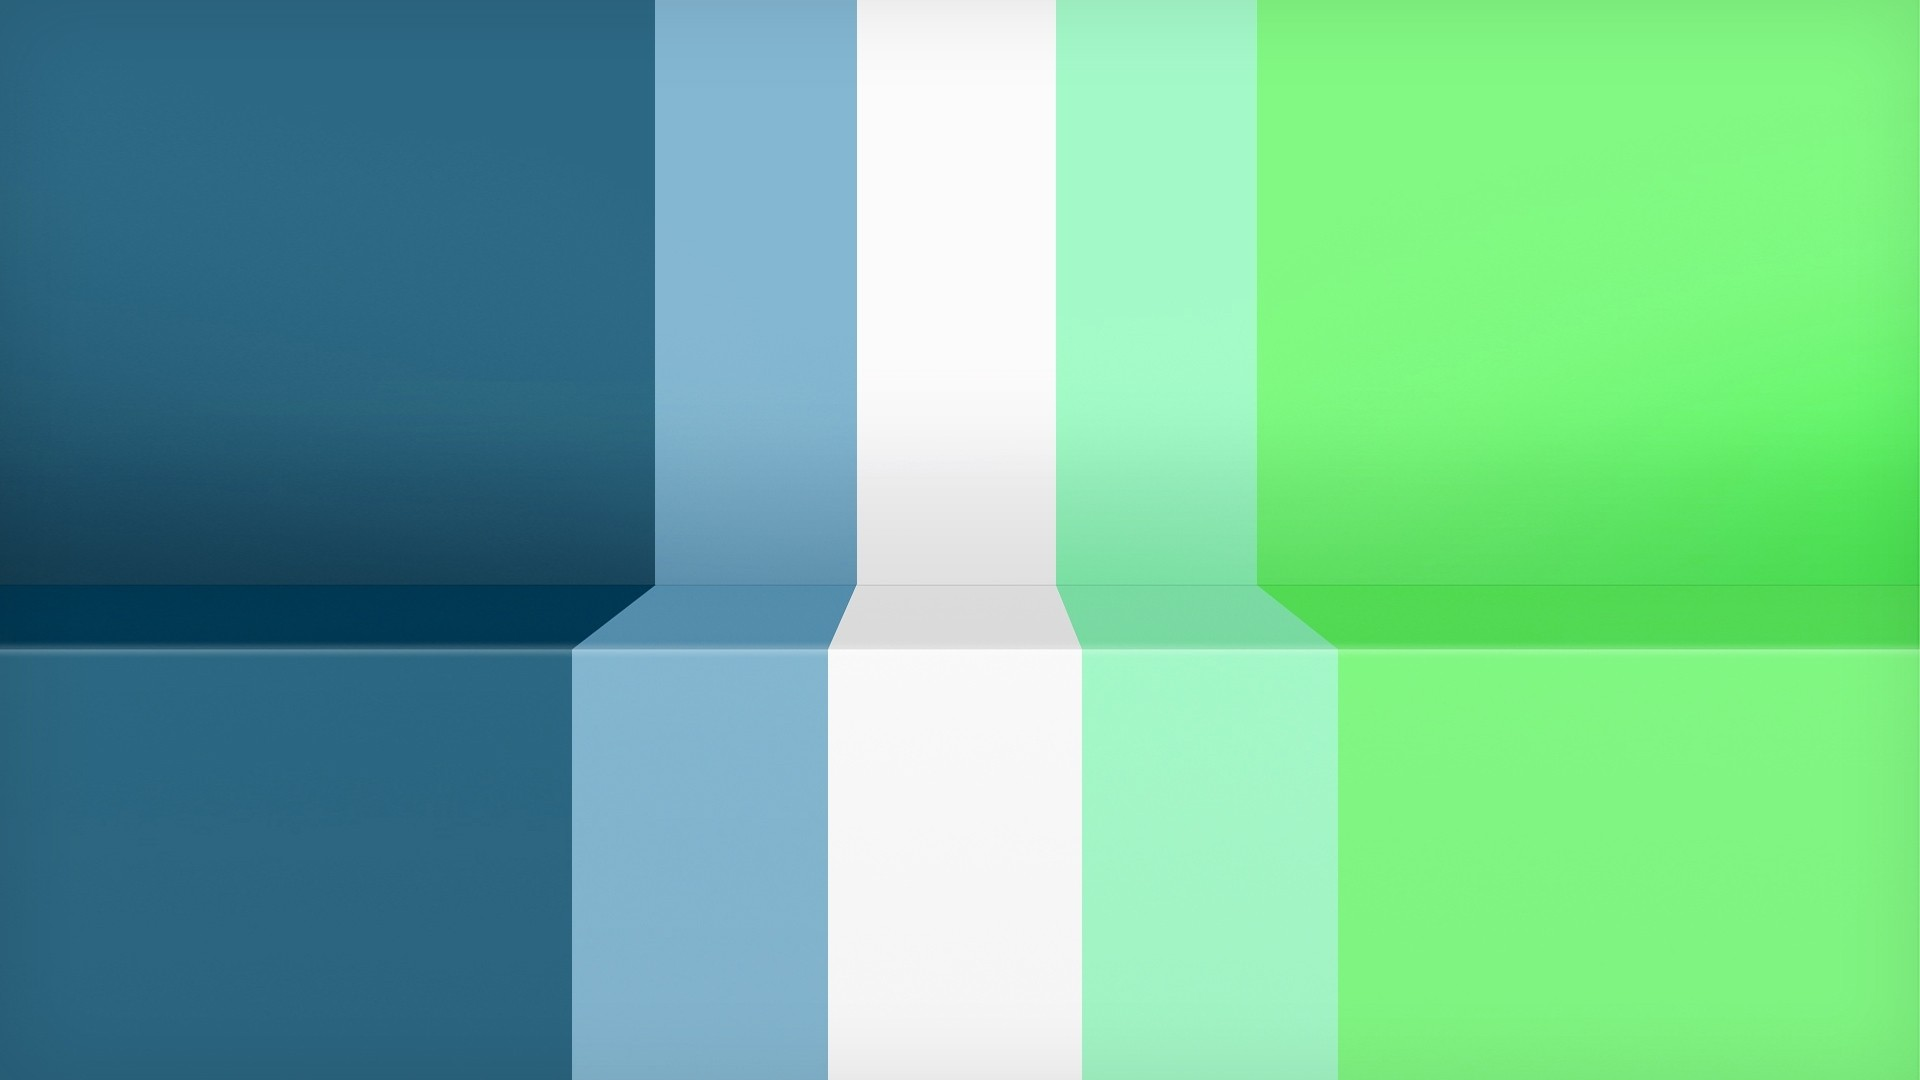 Pastel Color computer wallpaper